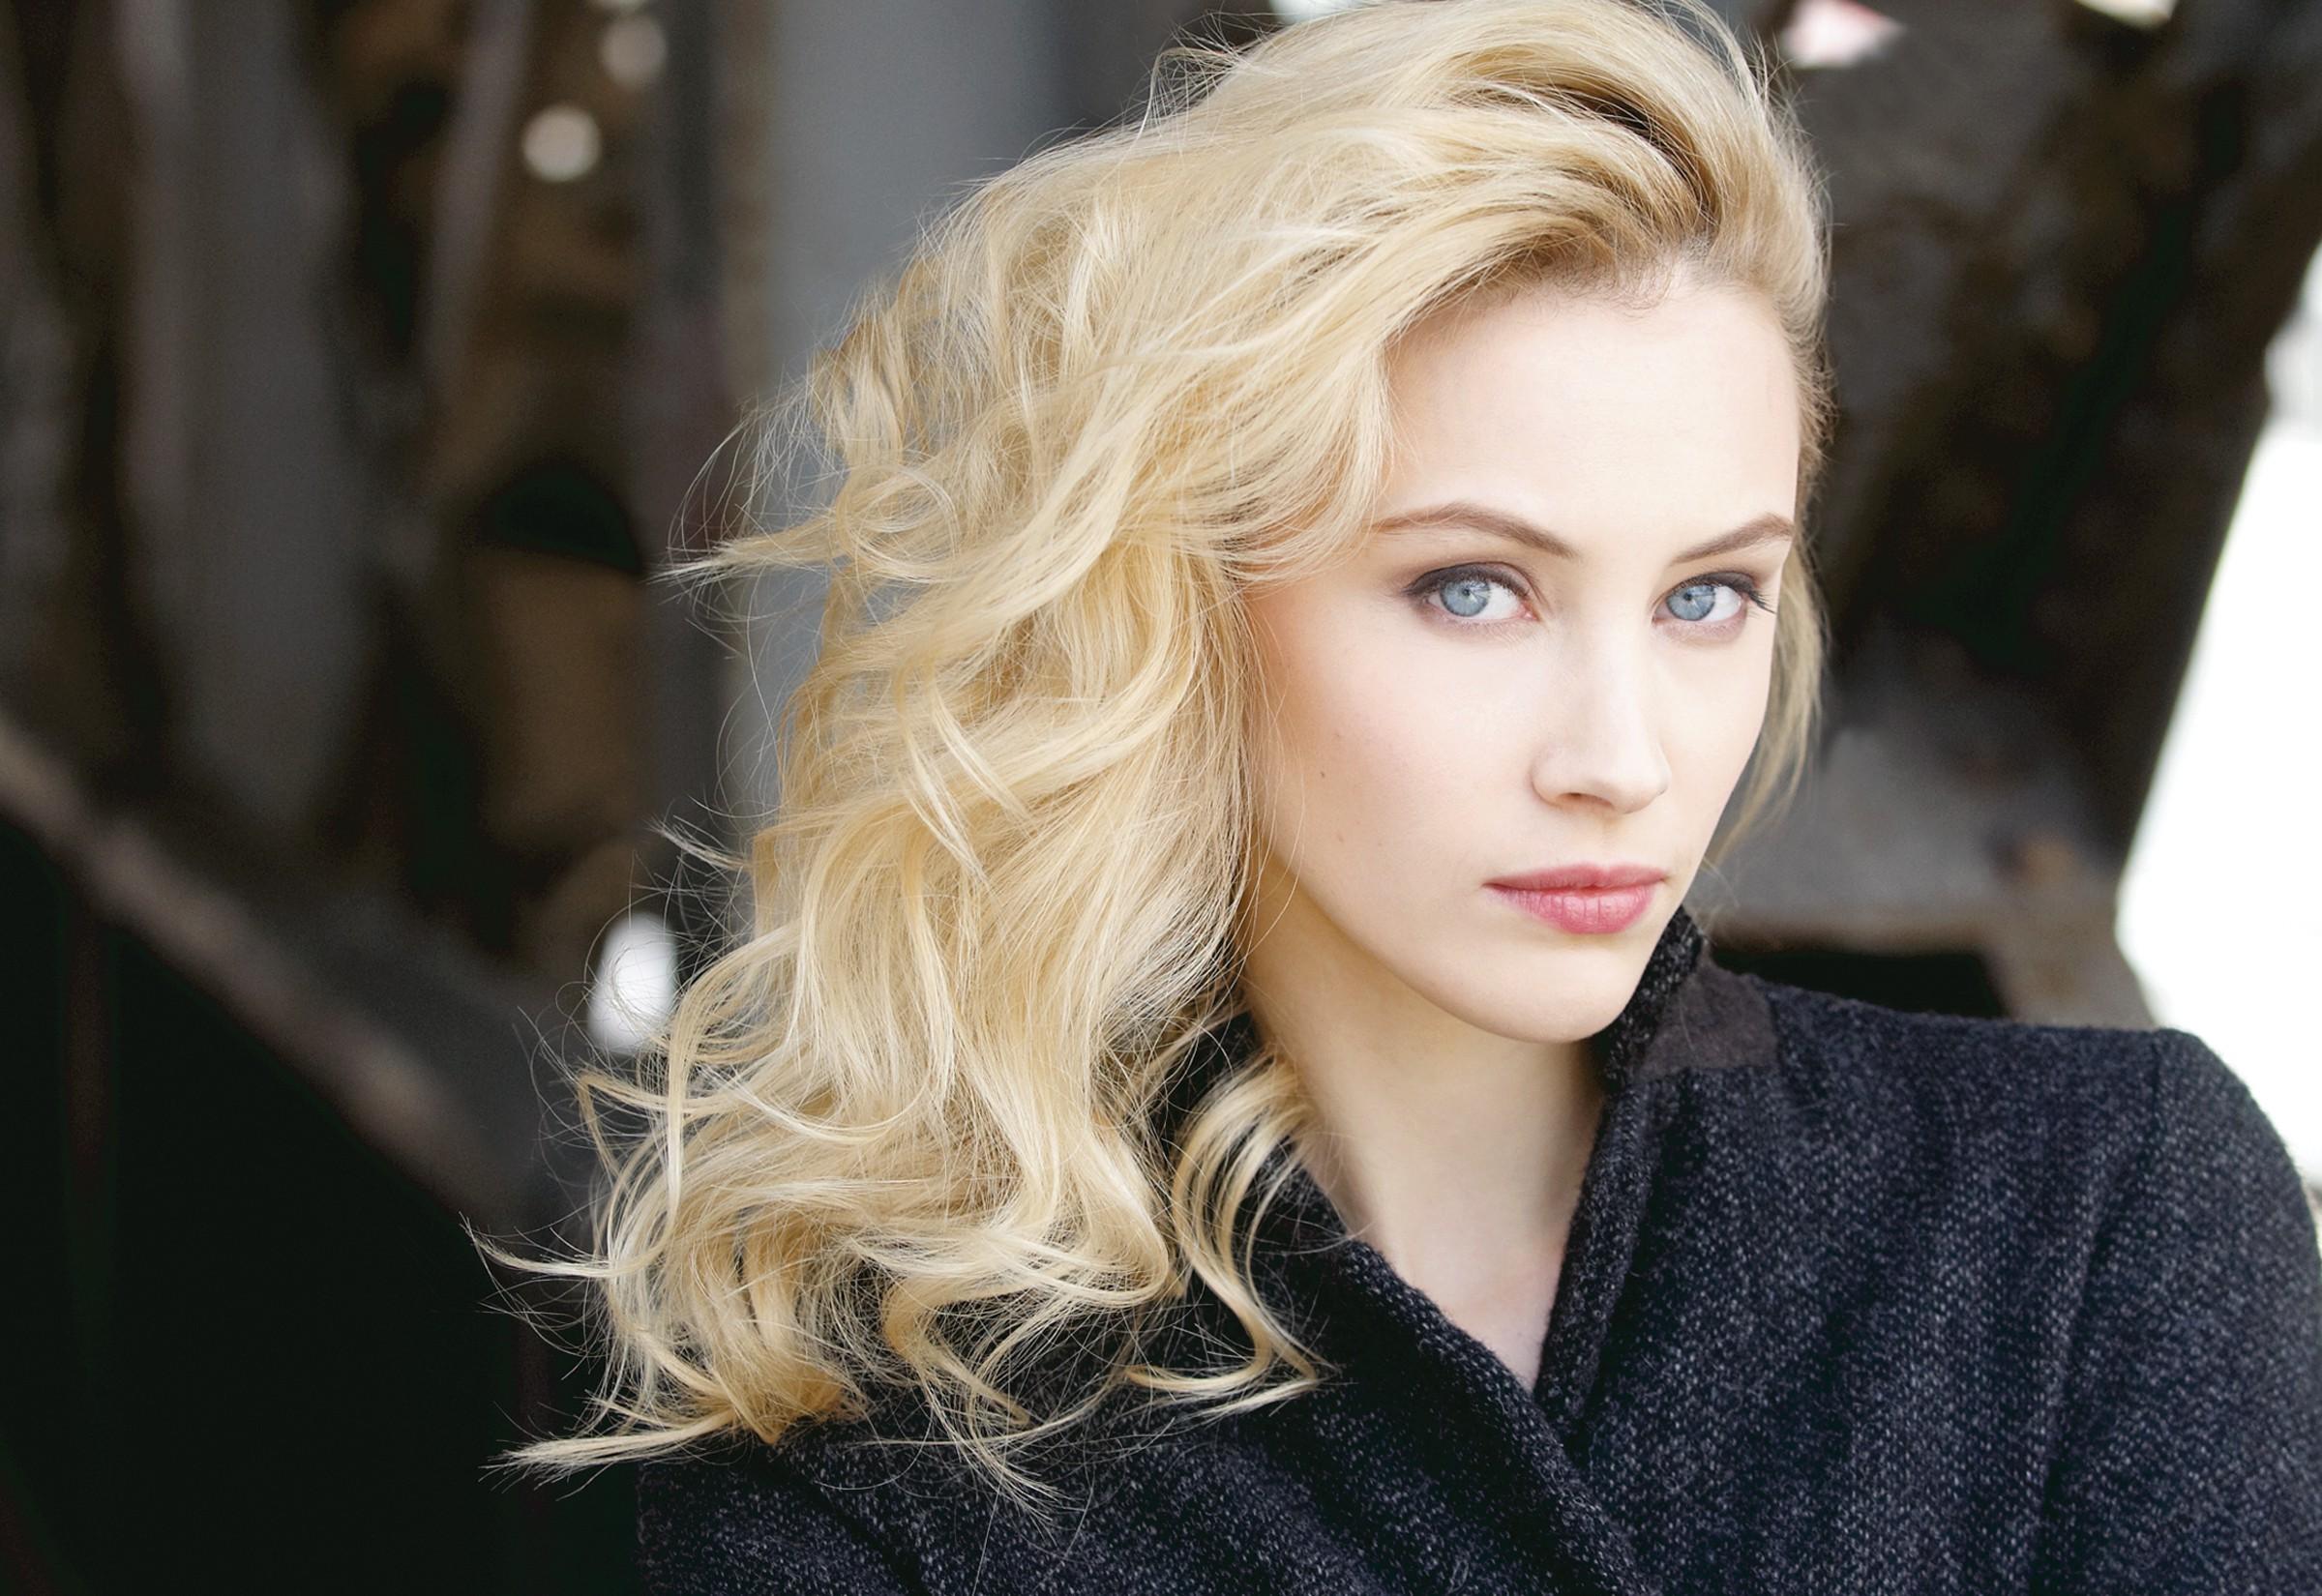 wallpaper 2400x1650 px actress blonde blue eyes